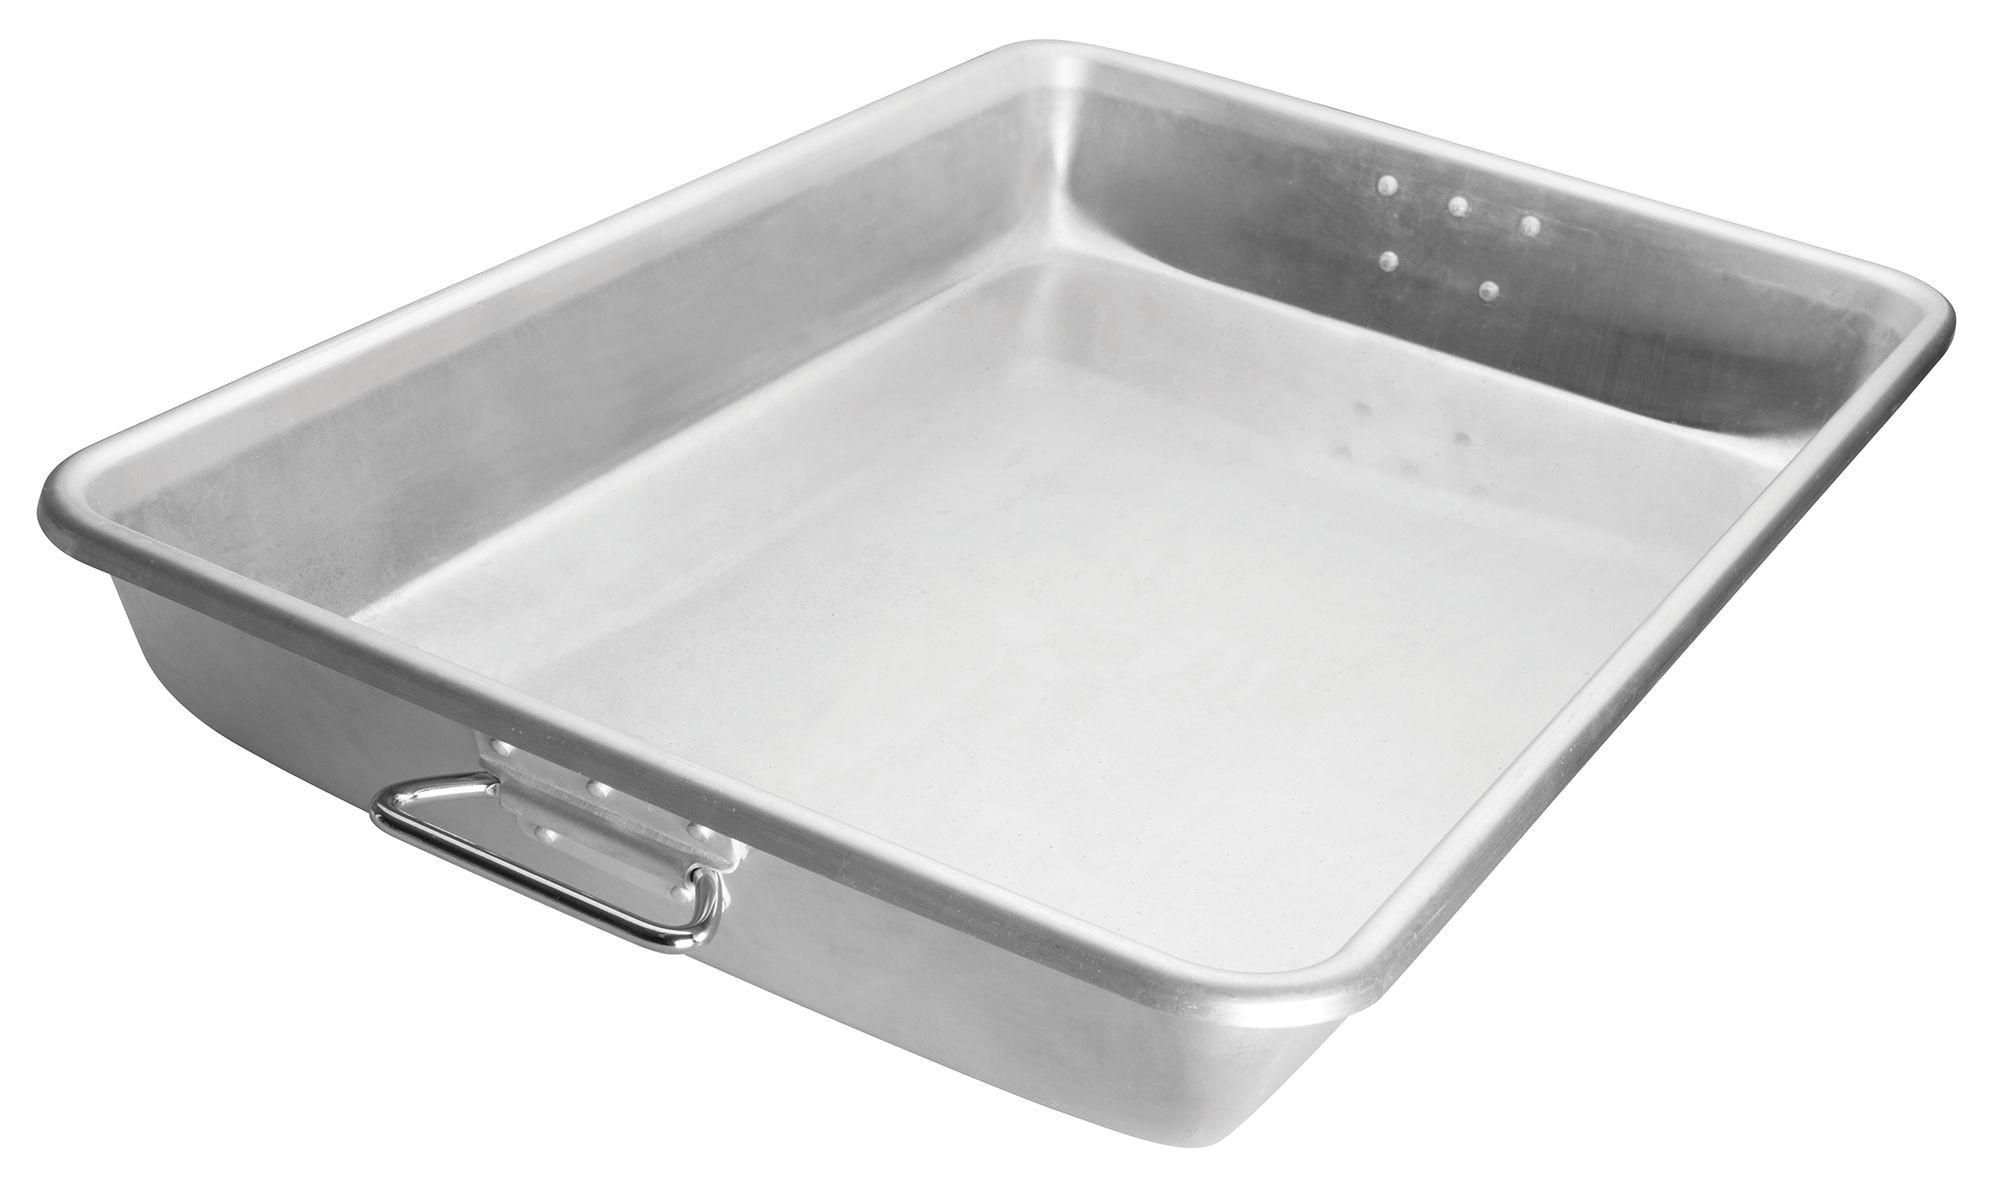 "Winco ALRP-1826H Aluminum Bake/Roast Pan with Handles 25-3/4"" x 17-3/4"""